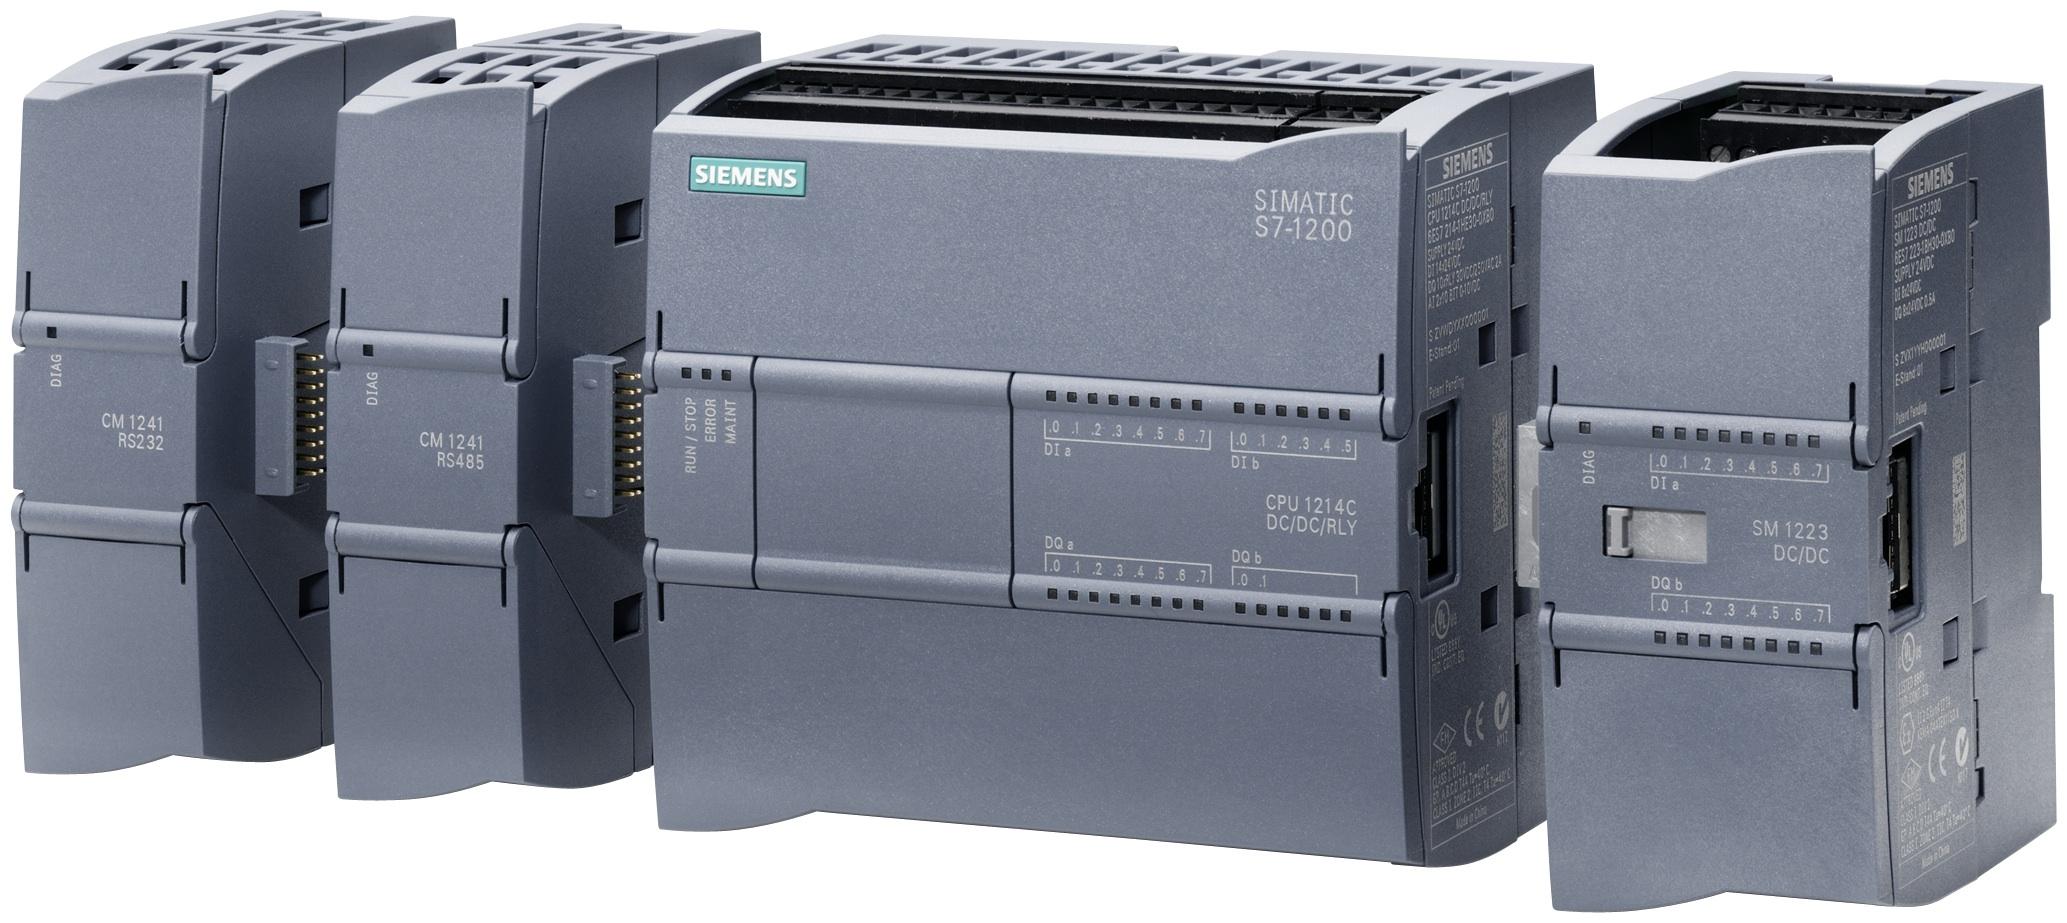 s7-1200 firmware 4.1